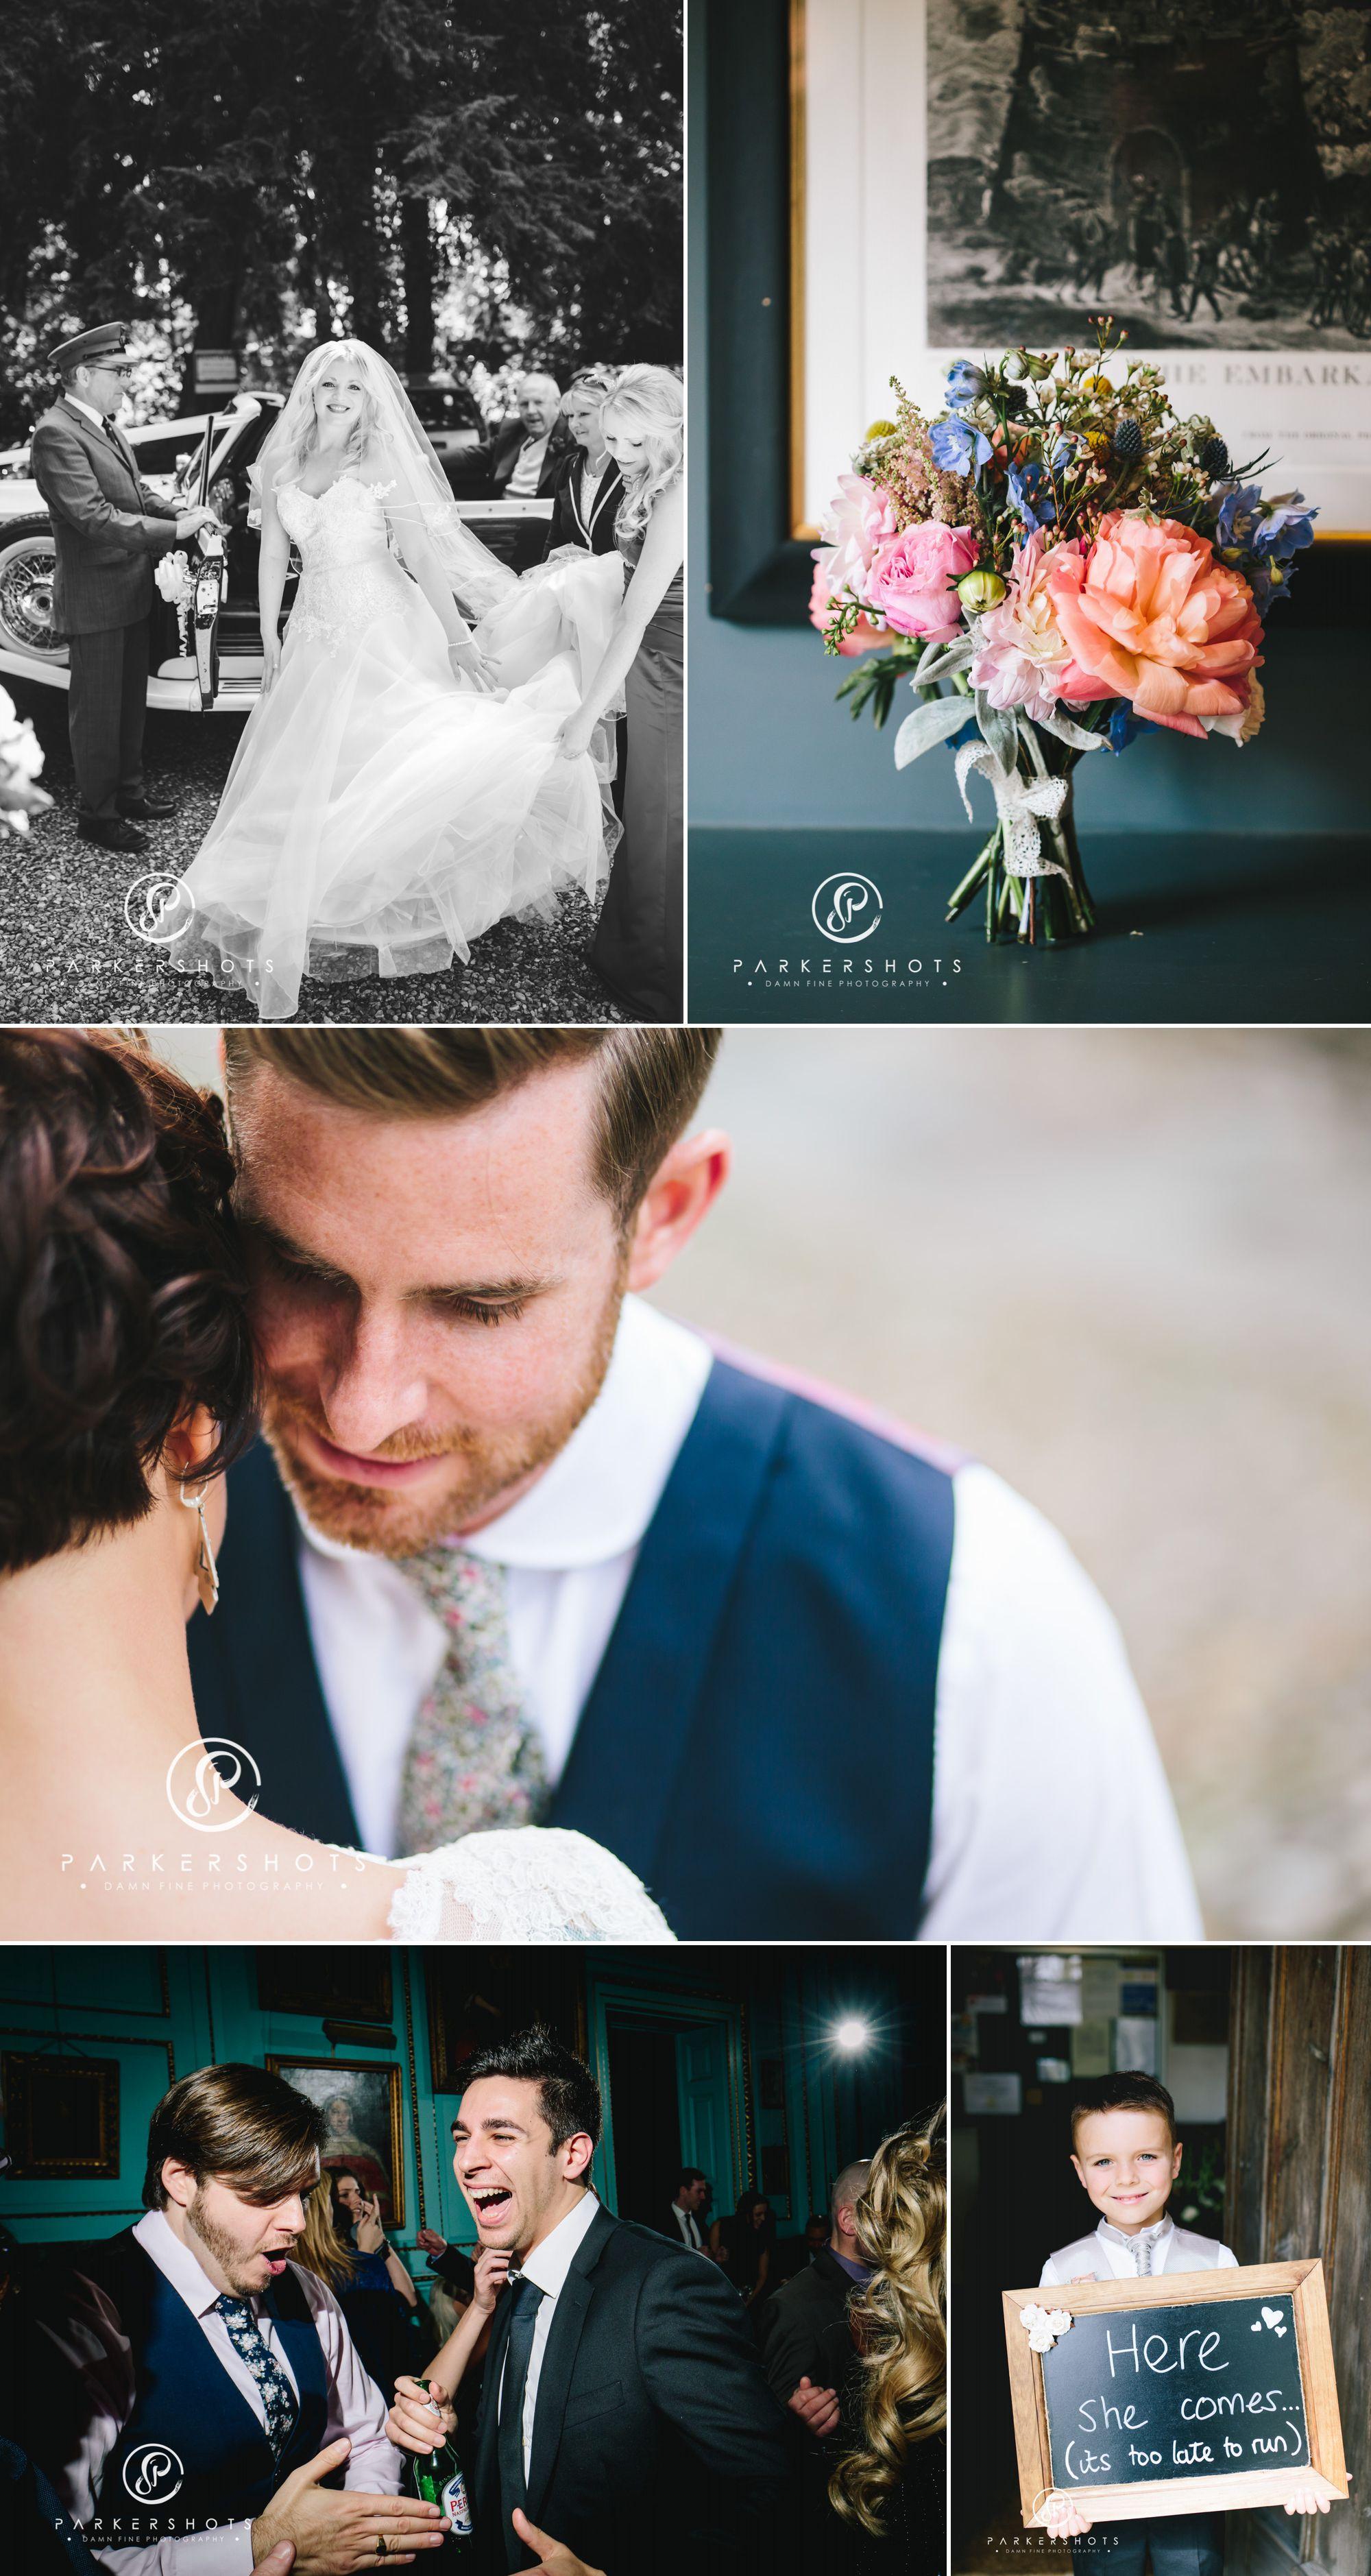 Best_Of_Wedding_Photographer_2015 5